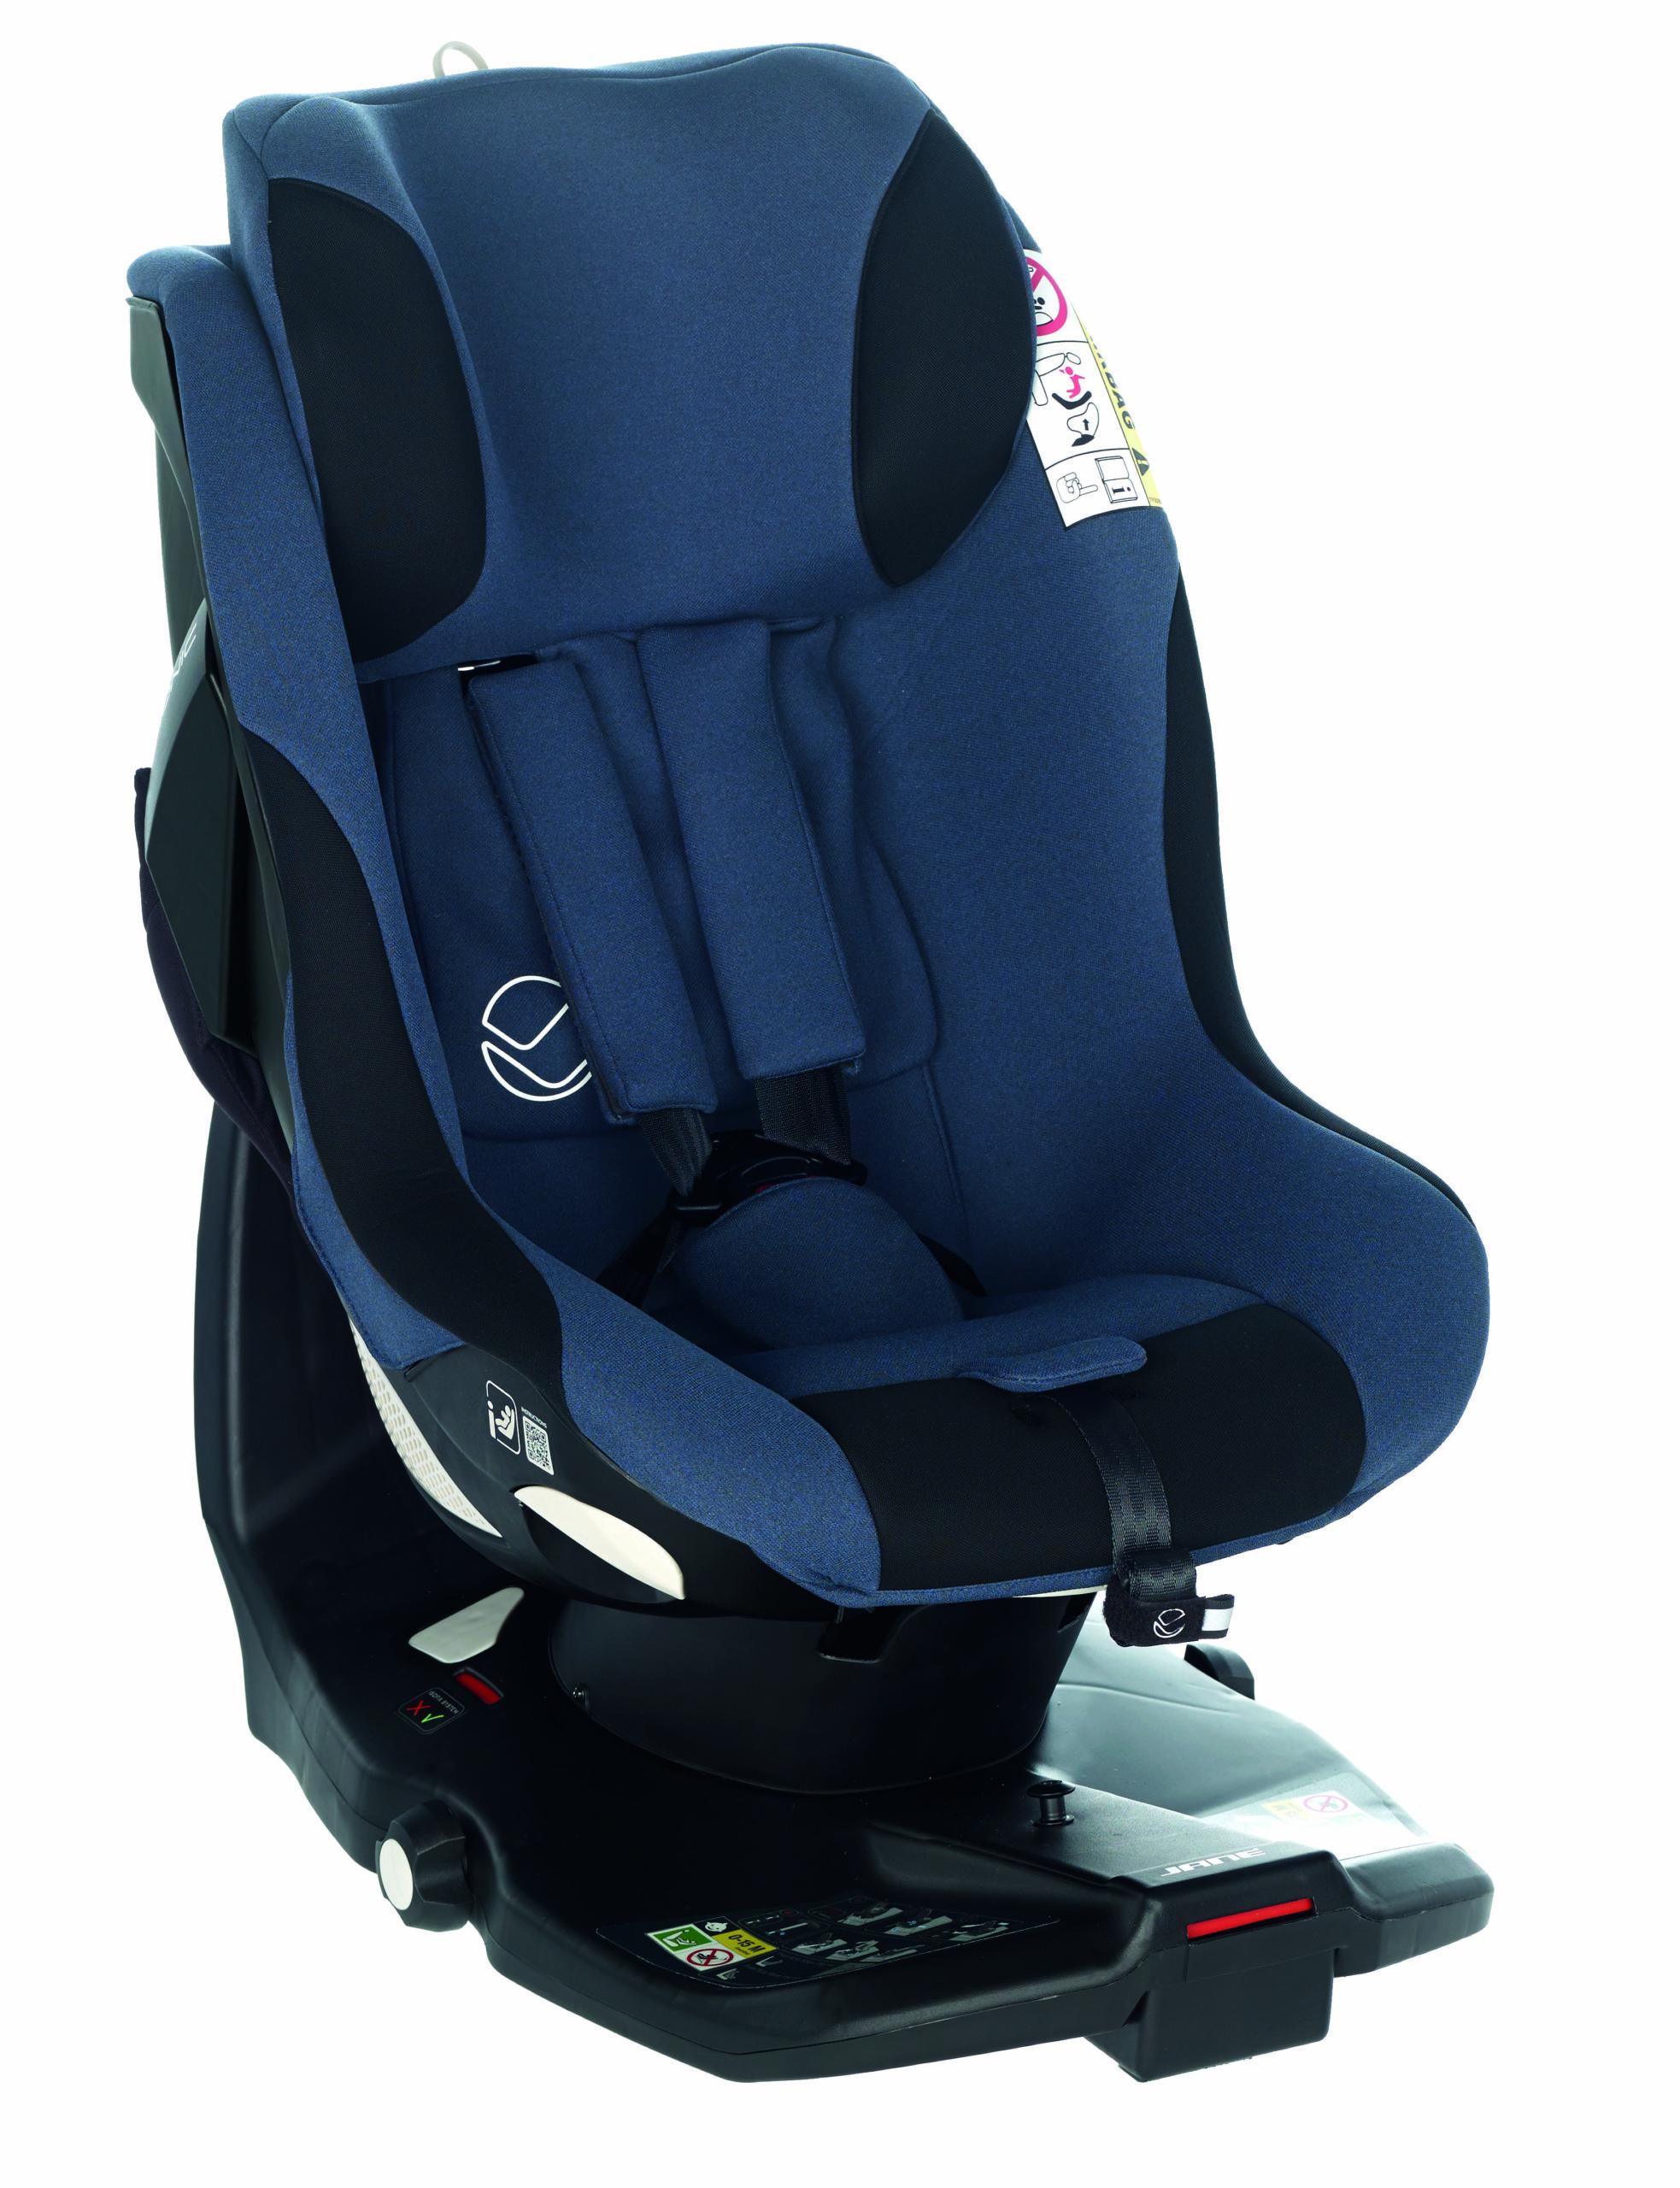 sillas de auto grupo 0 - Sillas de auto grupo 0